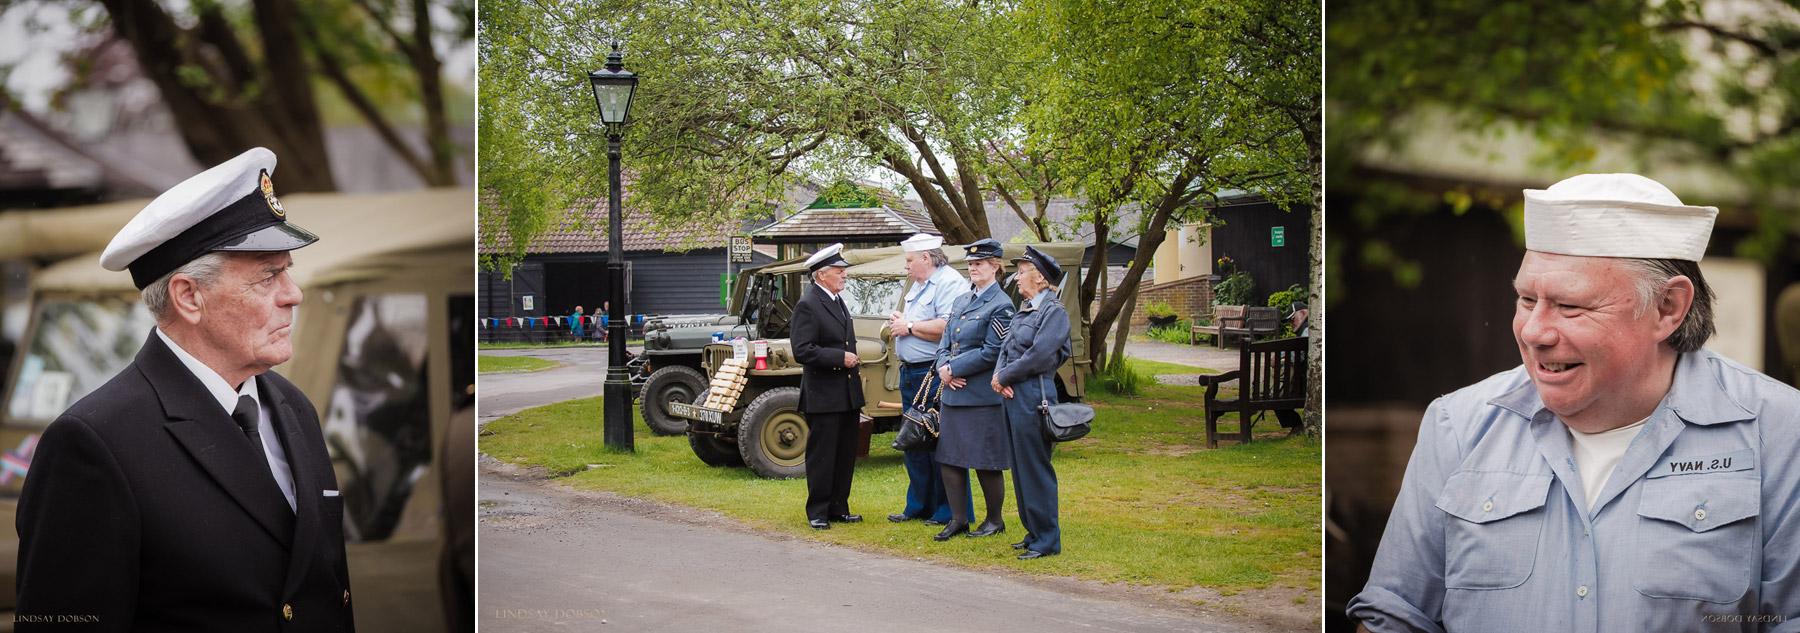 events-amberley-heritage-museum-sussex.jpg